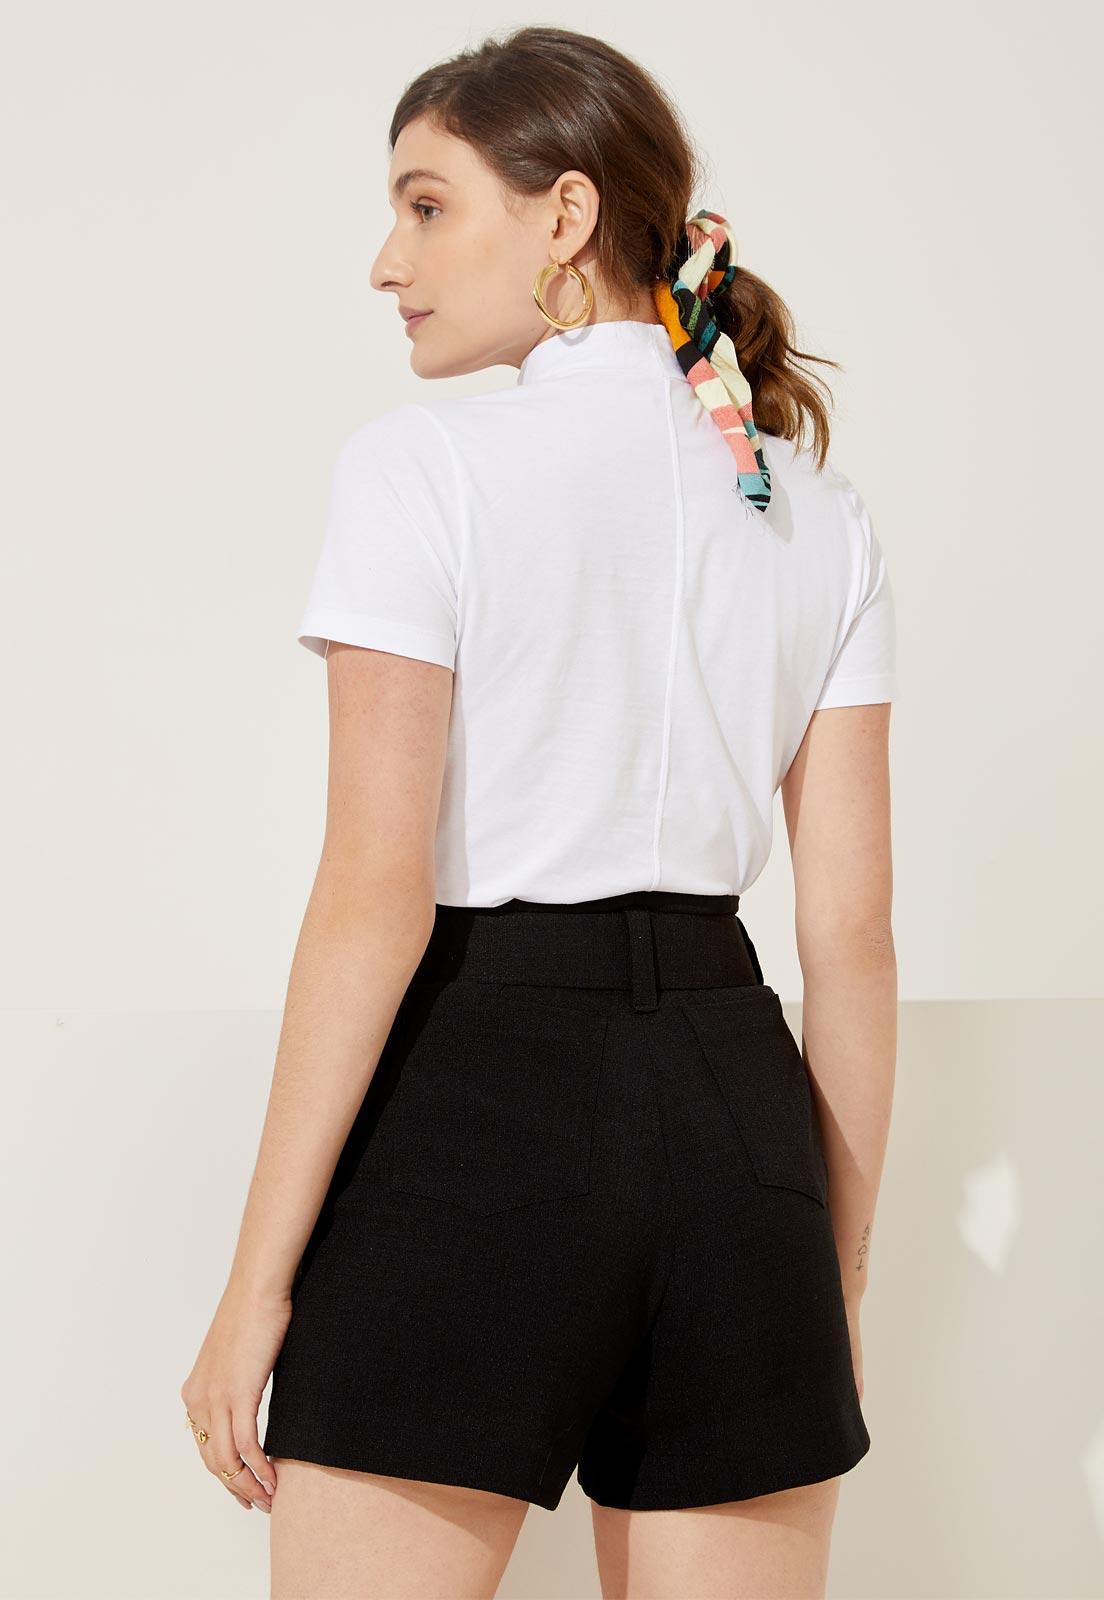 T-shirt Ana Branca